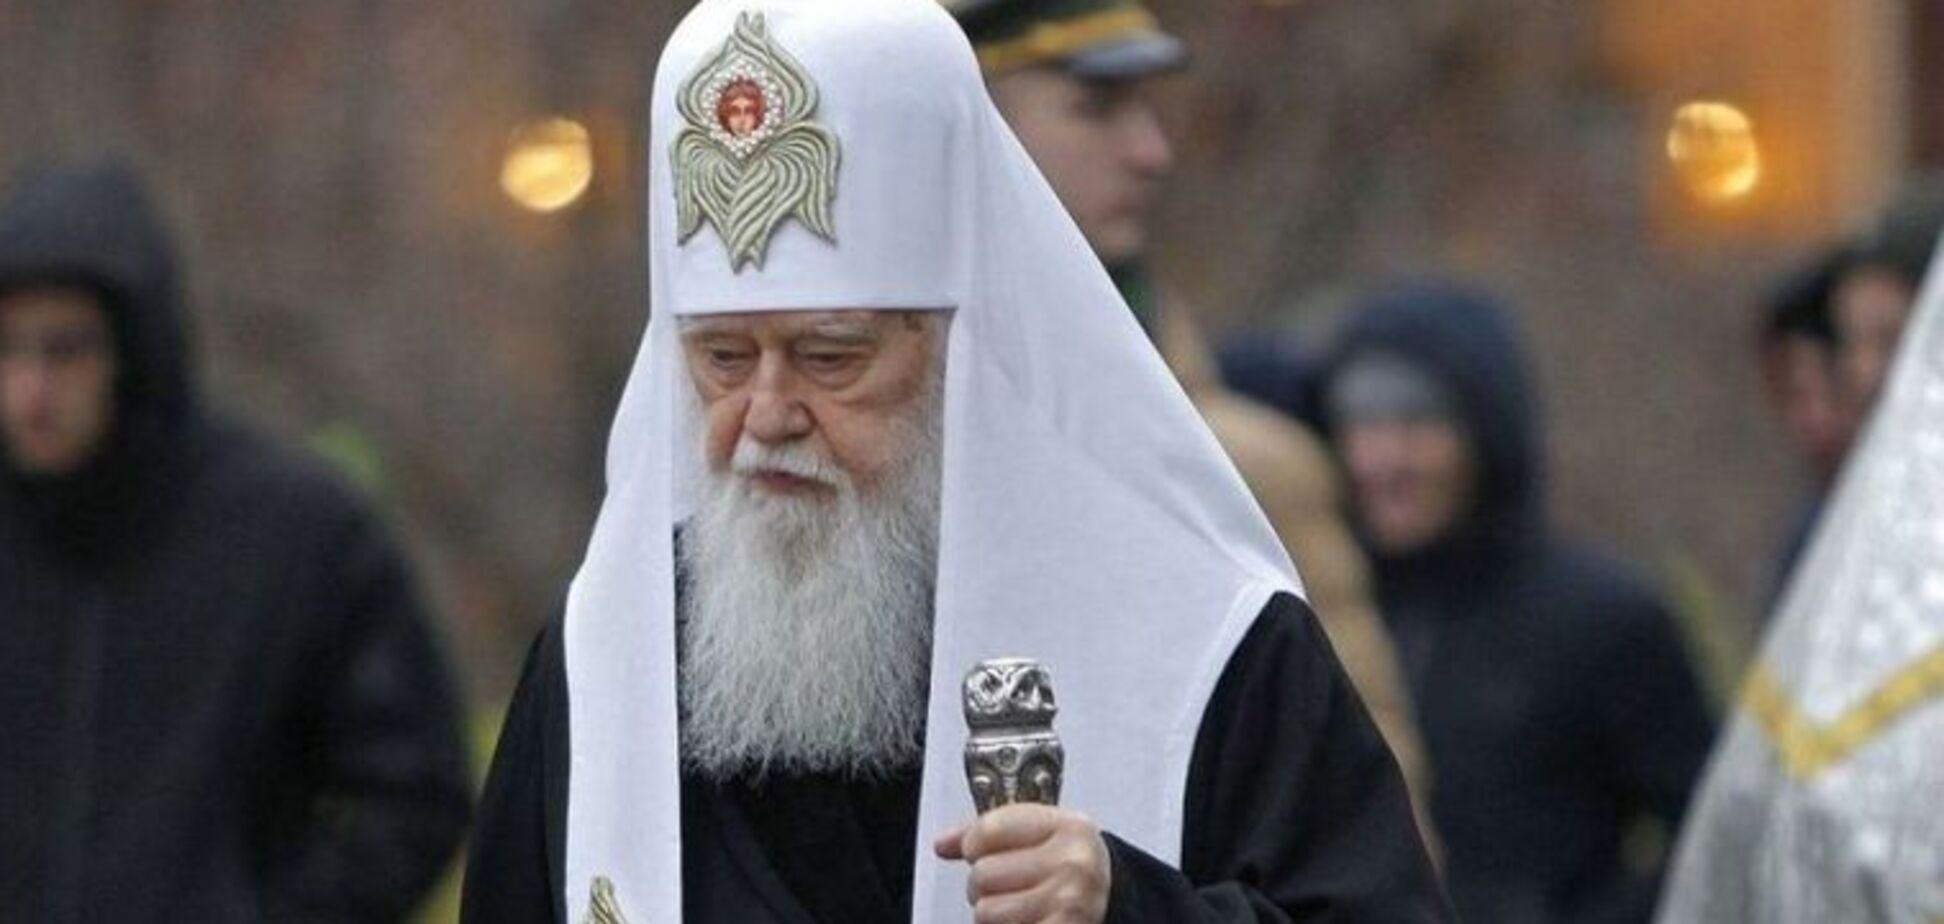 Константинополь заберет Томос? У Порошенко поставили на место Филарета